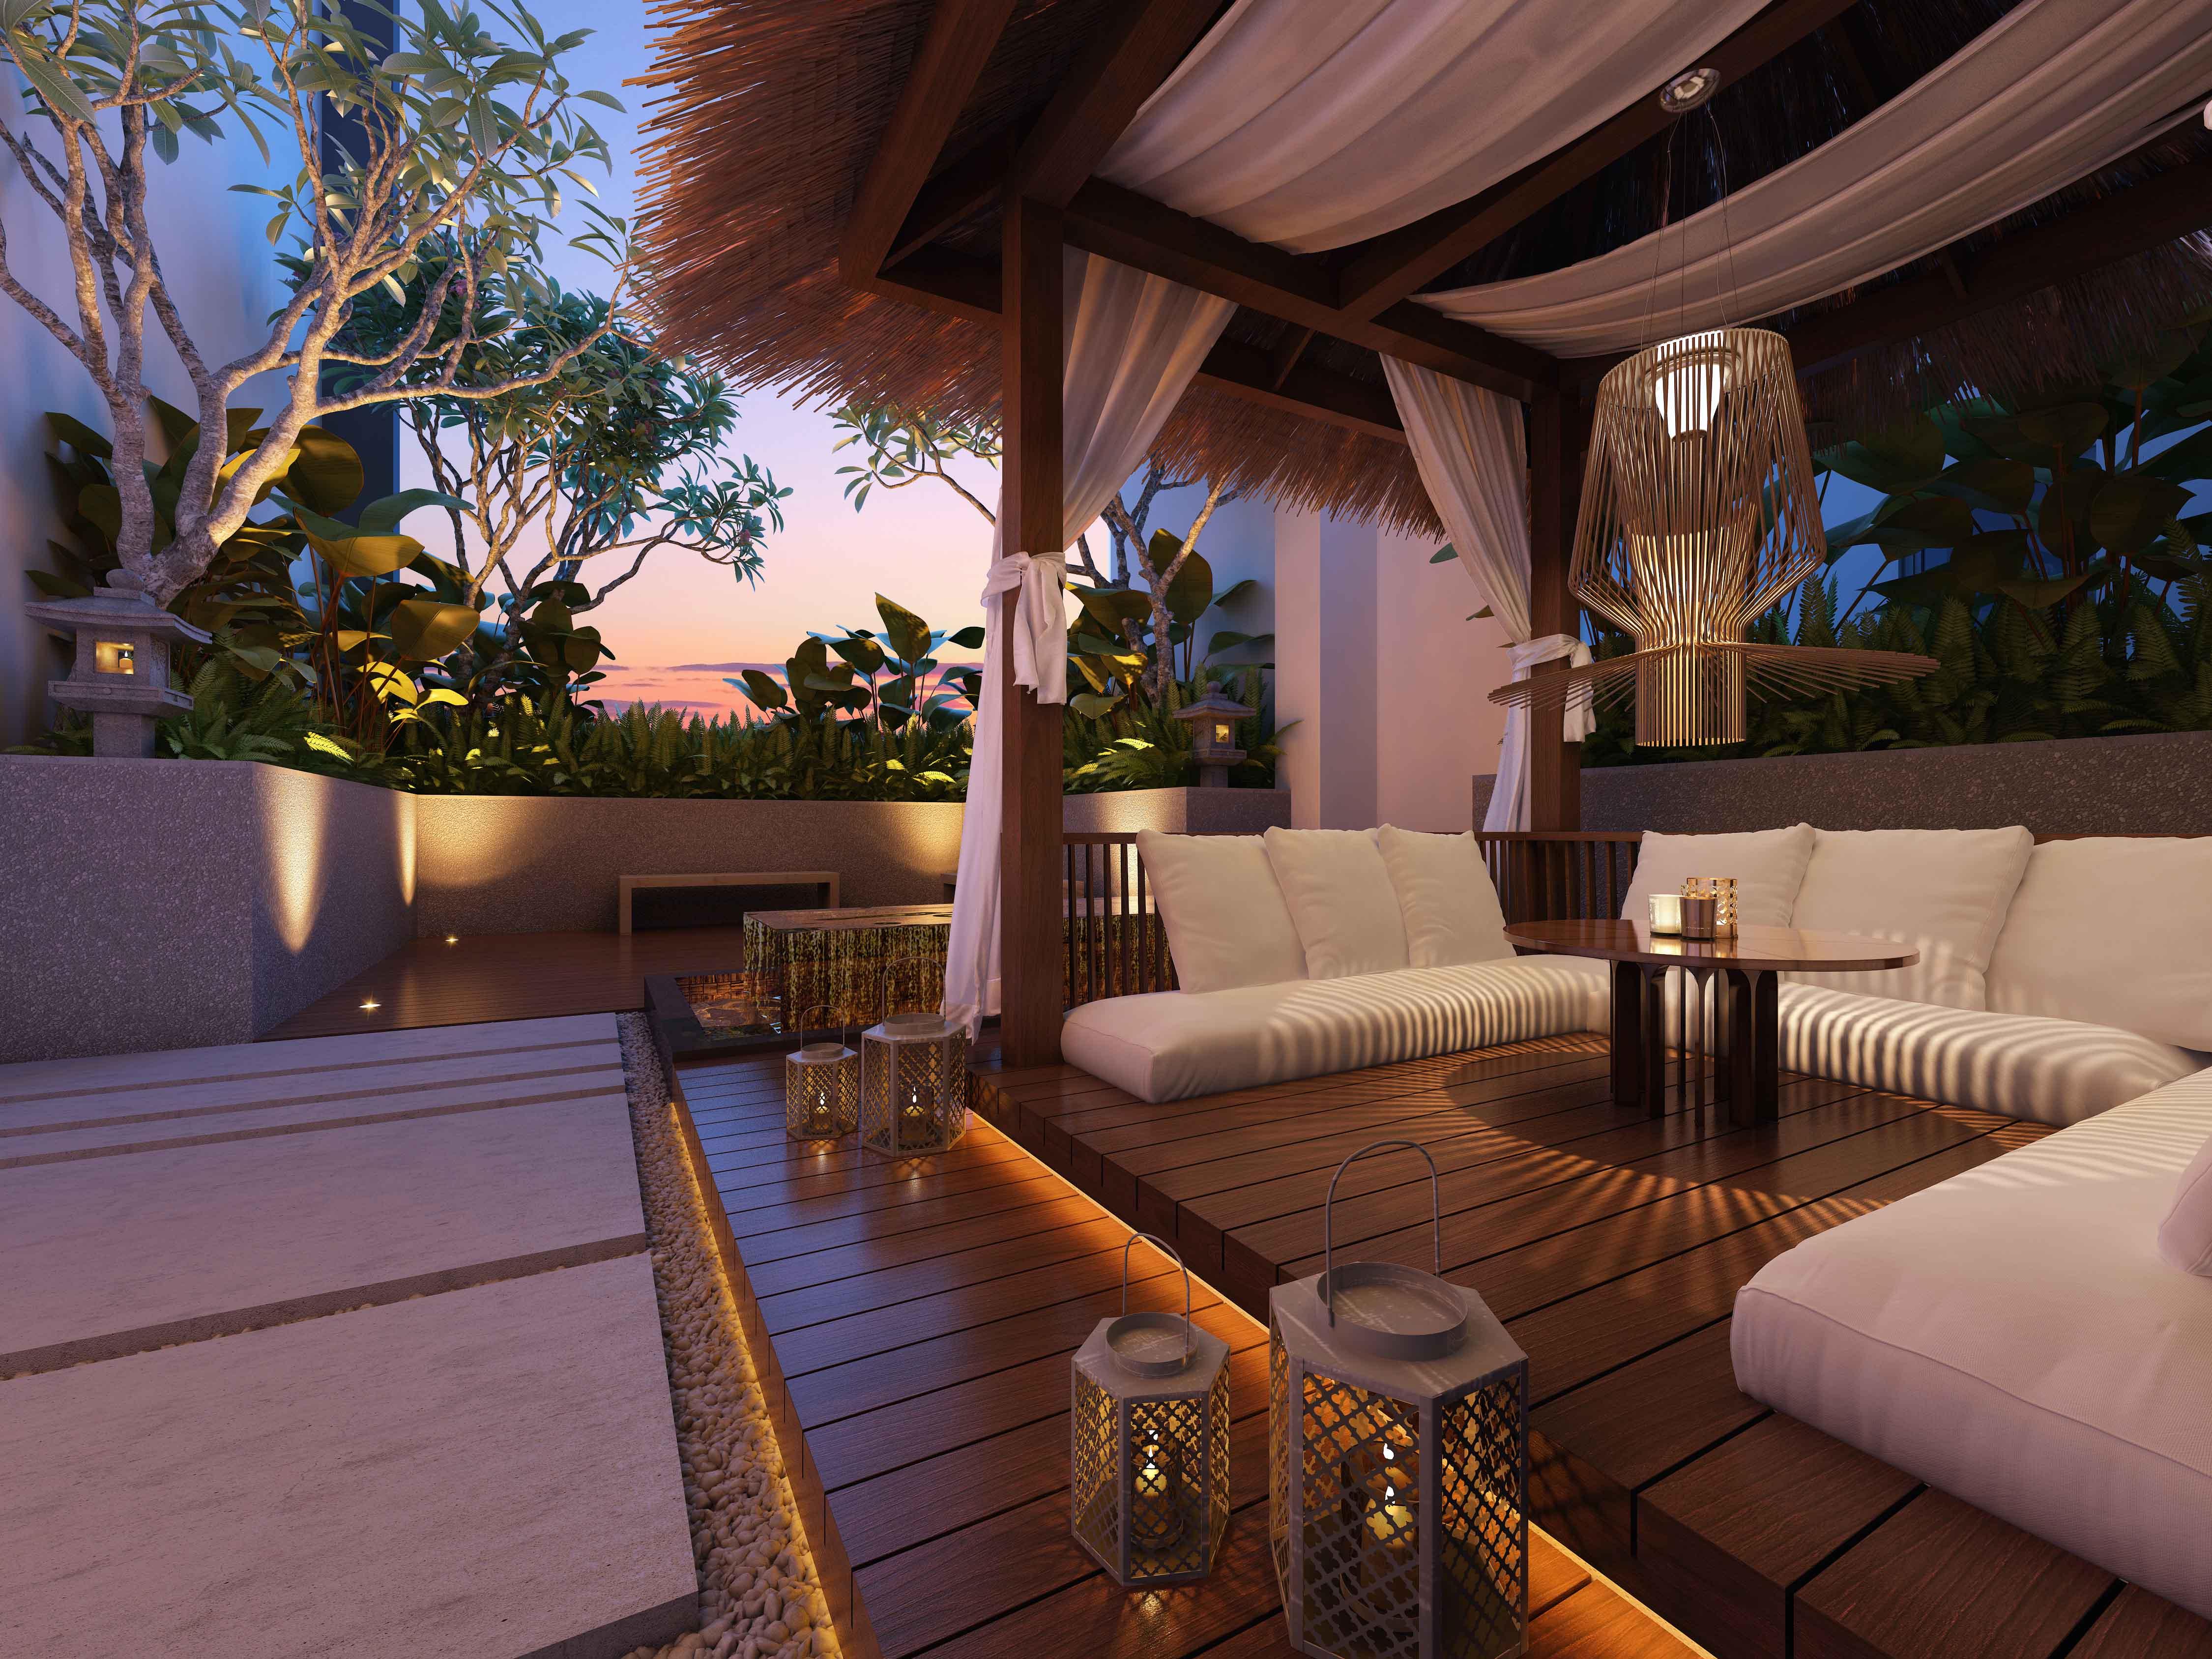 balinese_themed_sky_garden